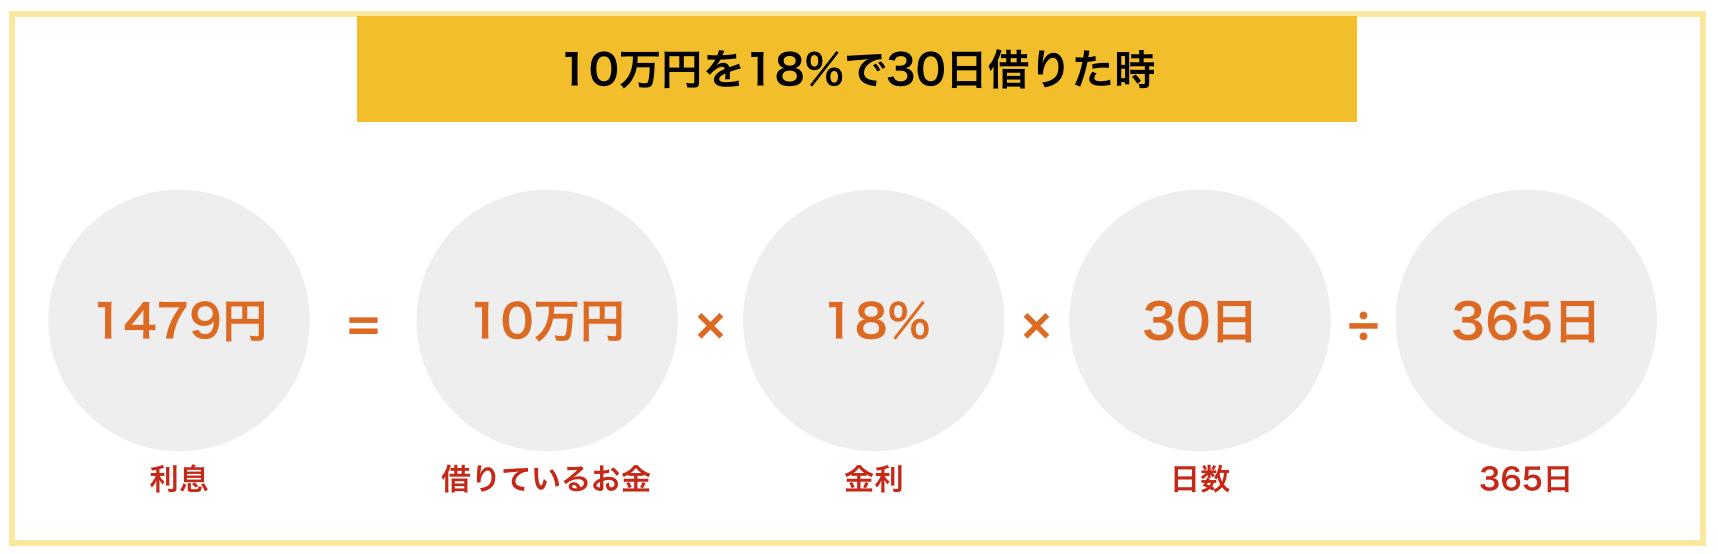 %e3%82%b9%e3%82%af%e3%83%aa%e3%83%bc%e3%83%b3%e3%82%b7%e3%83%a7%e3%83%83%e3%83%88-2016-09-28-18-55-51